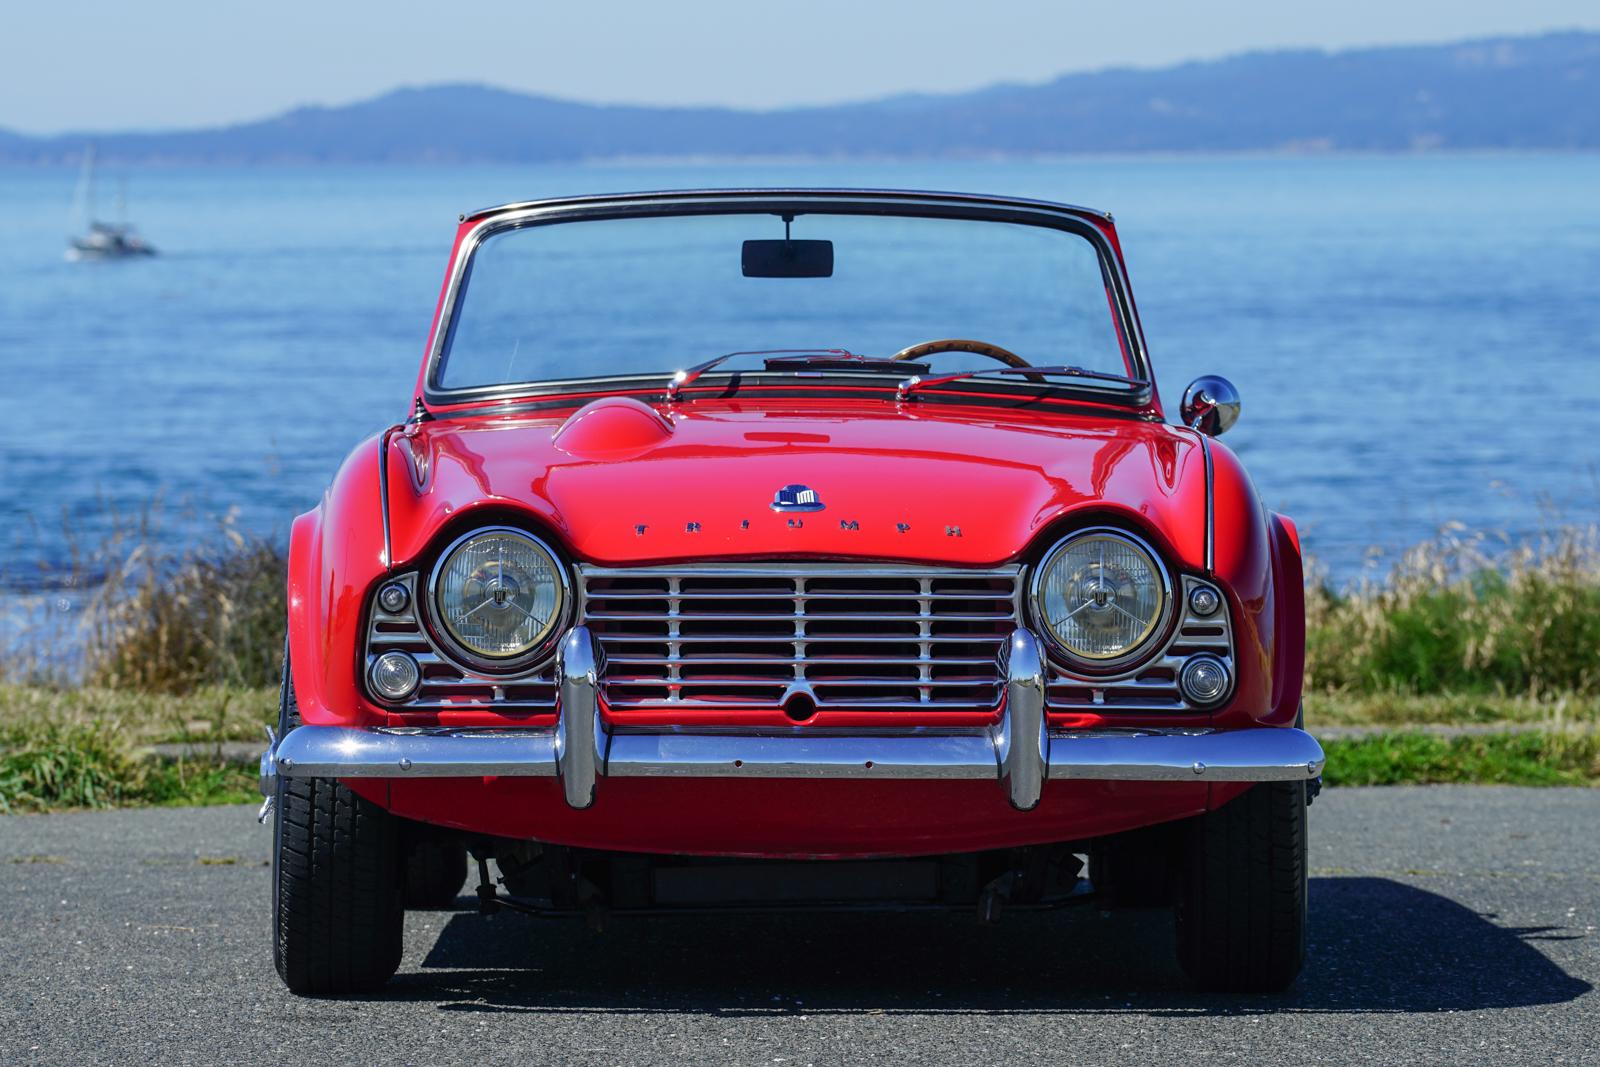 1963 Triumph TR4 For Sale | Silver Arrow Cars Ltd